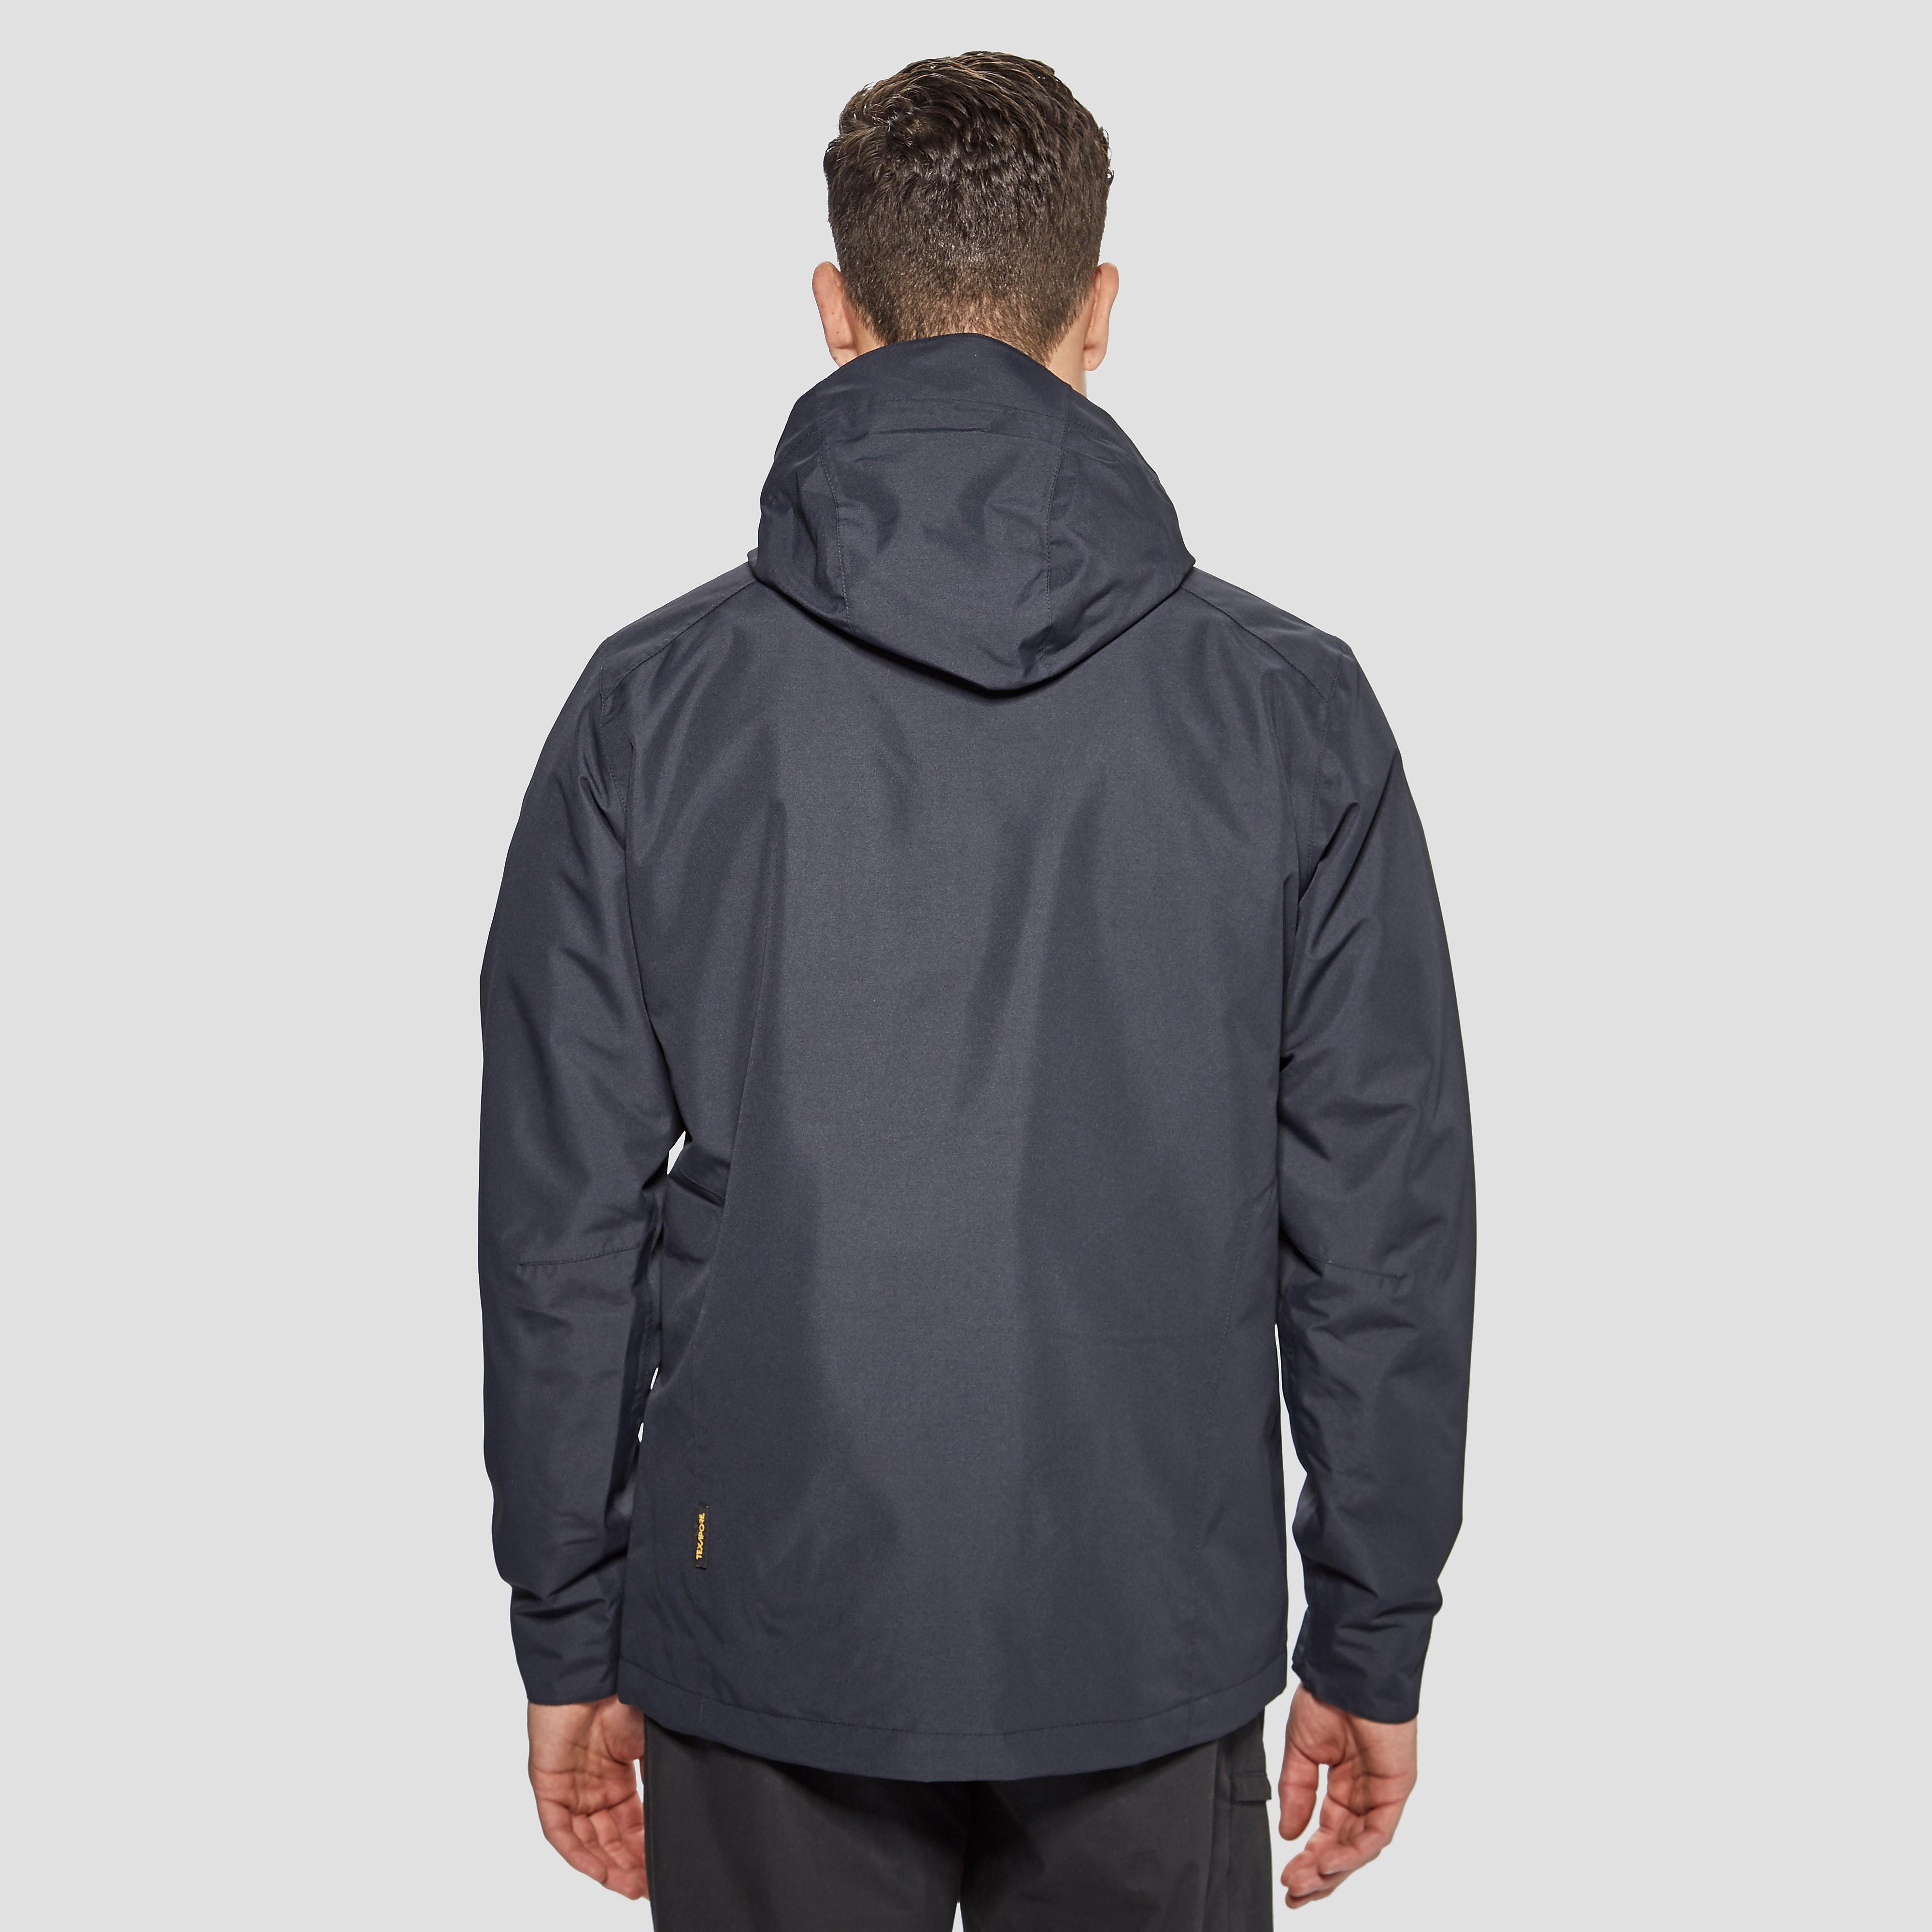 Jack Wolfskin Chilly Morning Men's Jacket